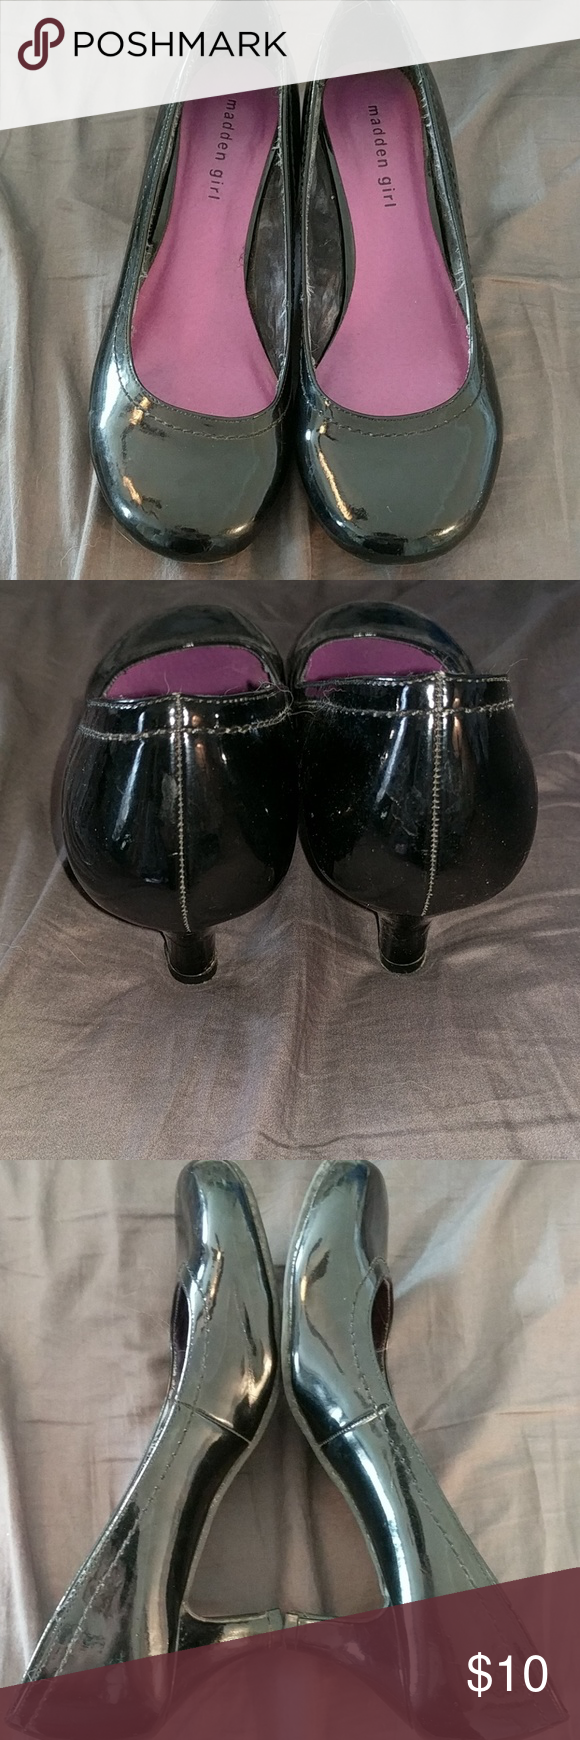 Black patent kitten heels Kitten heels, Madden girl